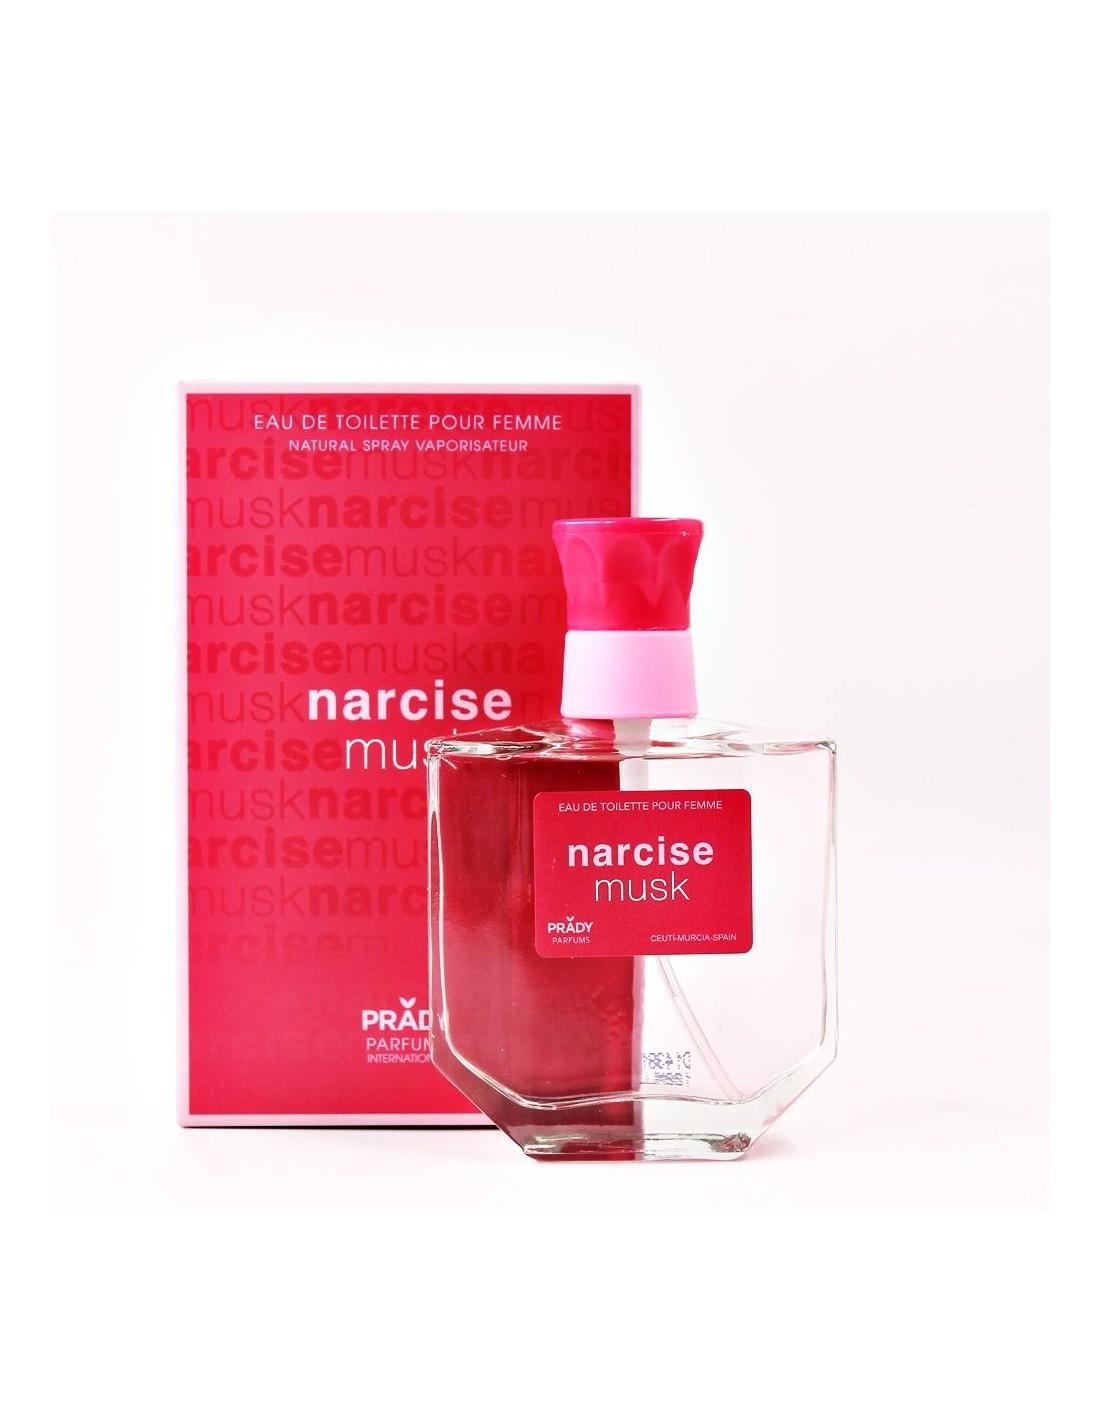 Parfum generique parfum prady femme narcise prady musk